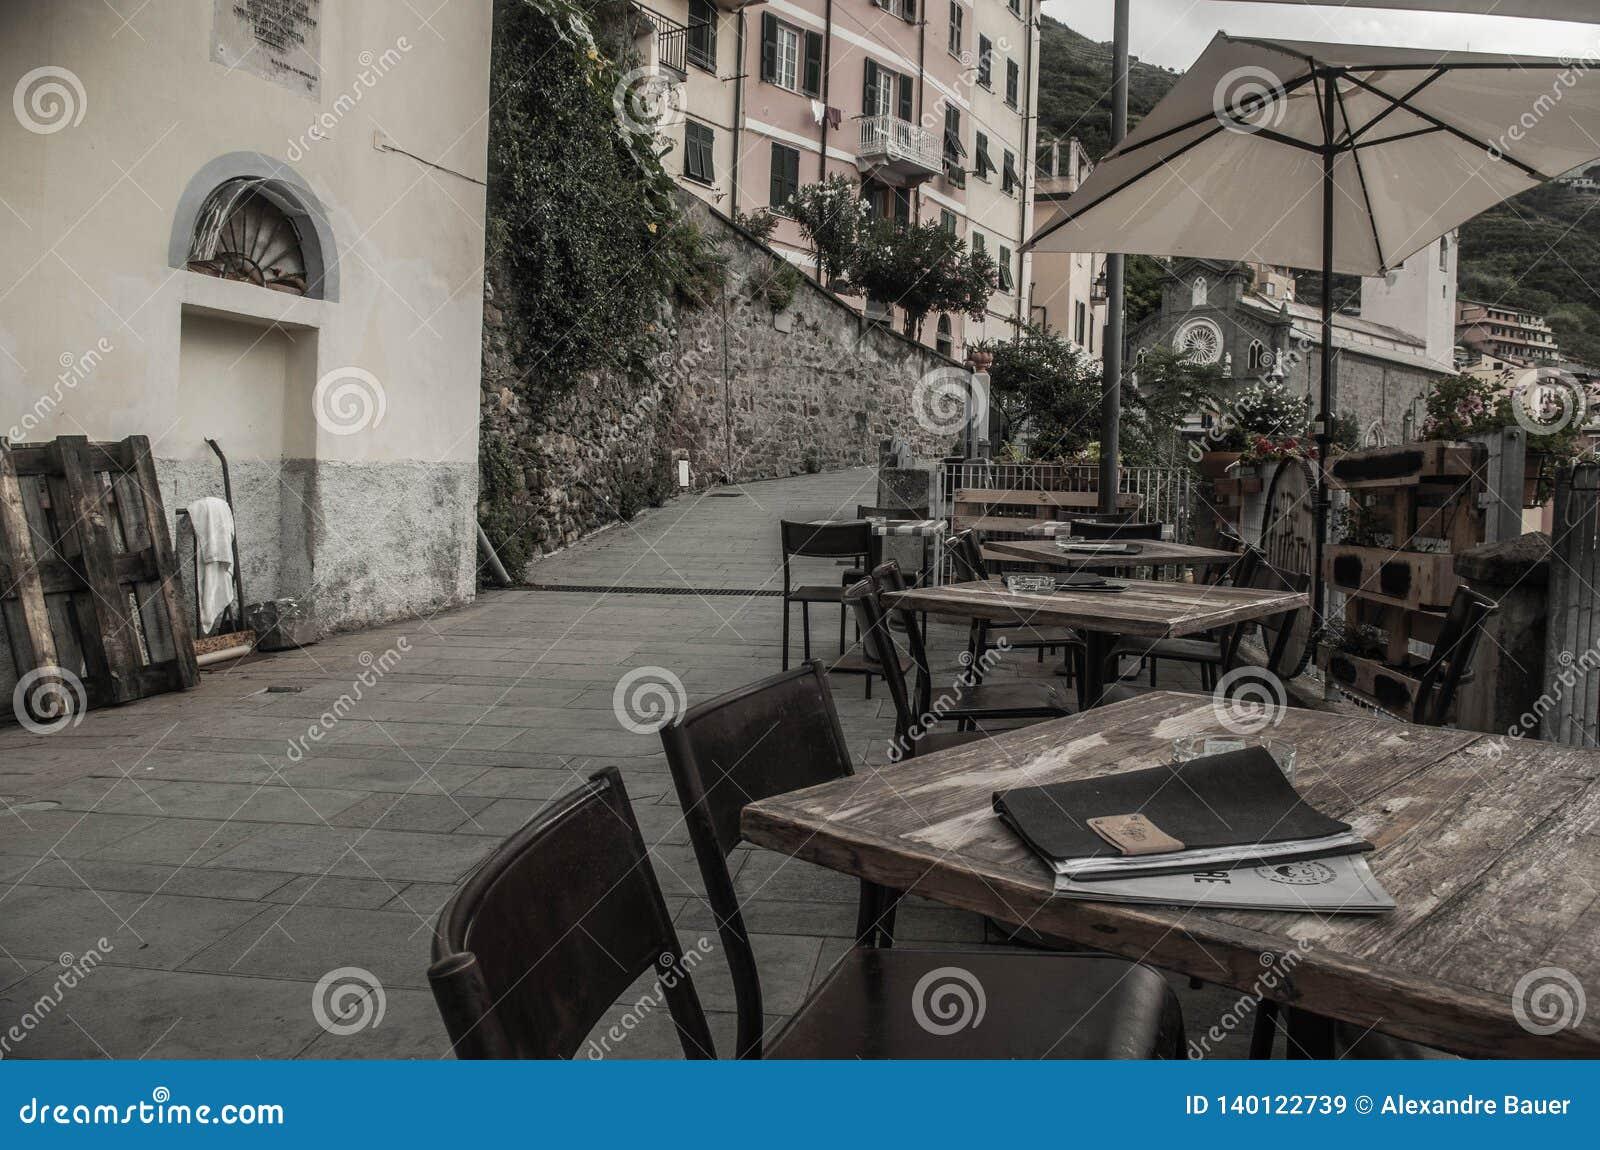 Frühstück in cinque terre, Italien